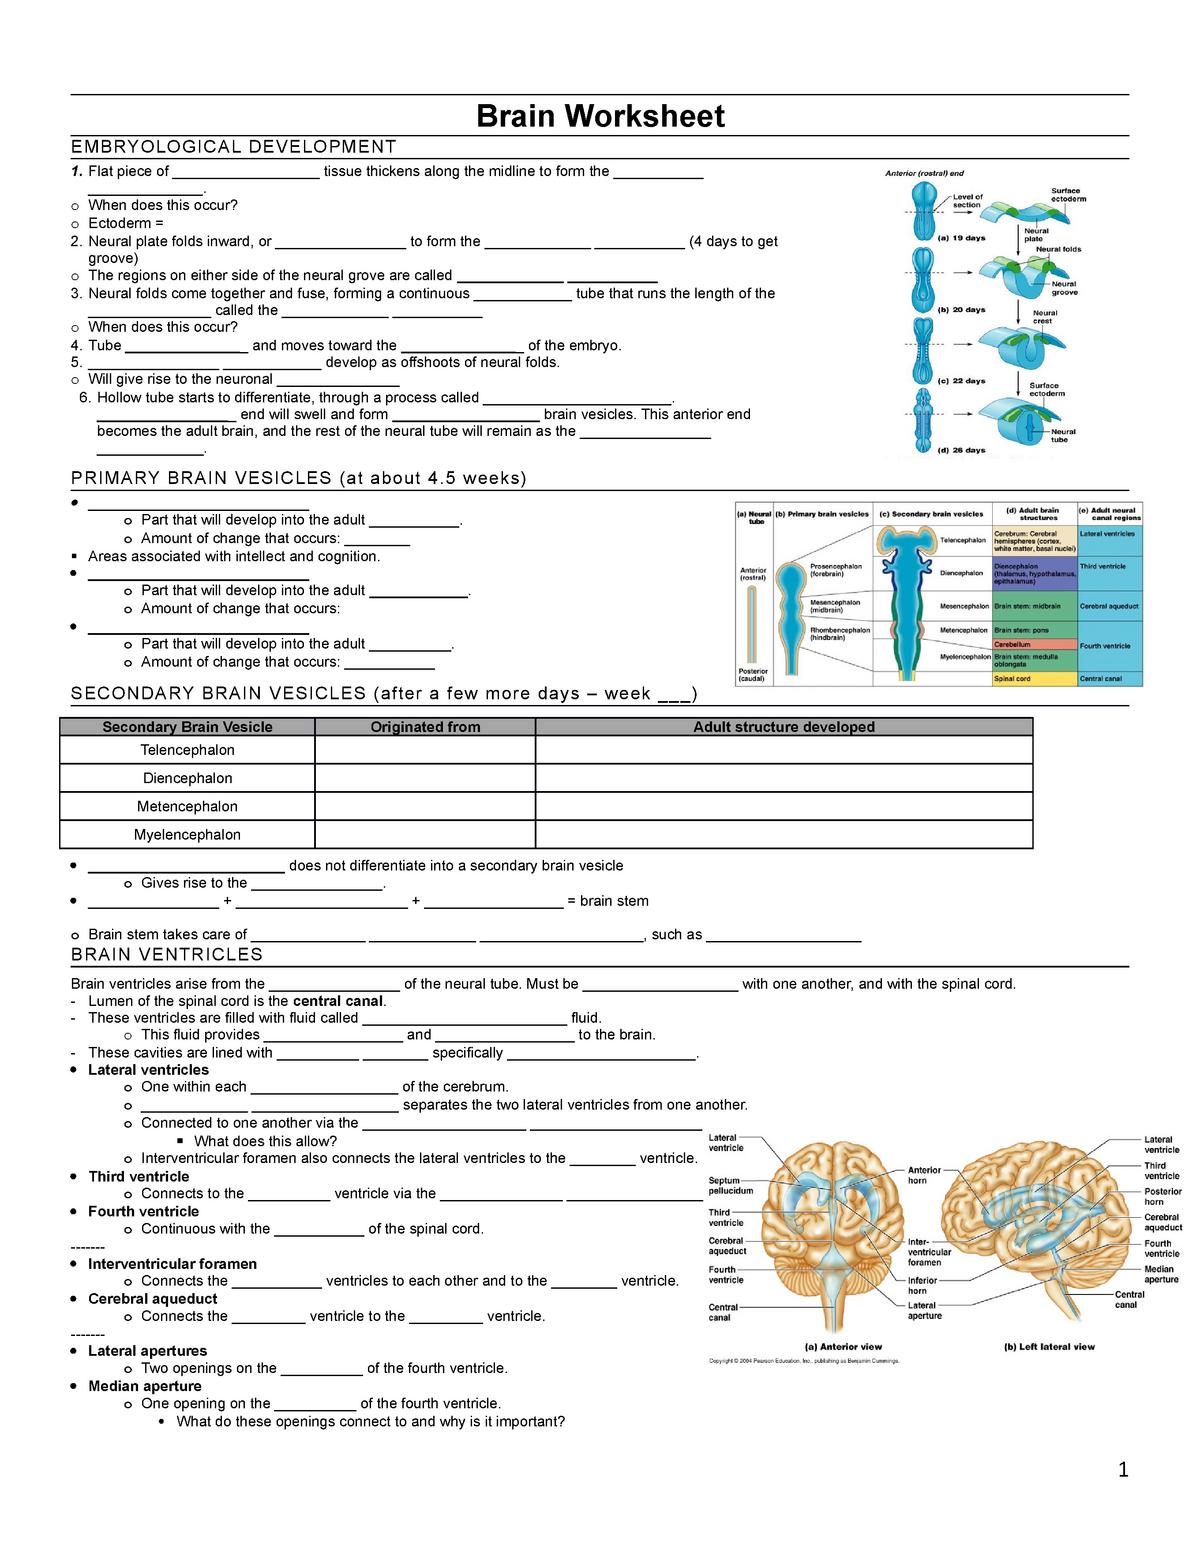 AP 2 Final Exam Consolidated PAL - BIOL 222 - StuDocu